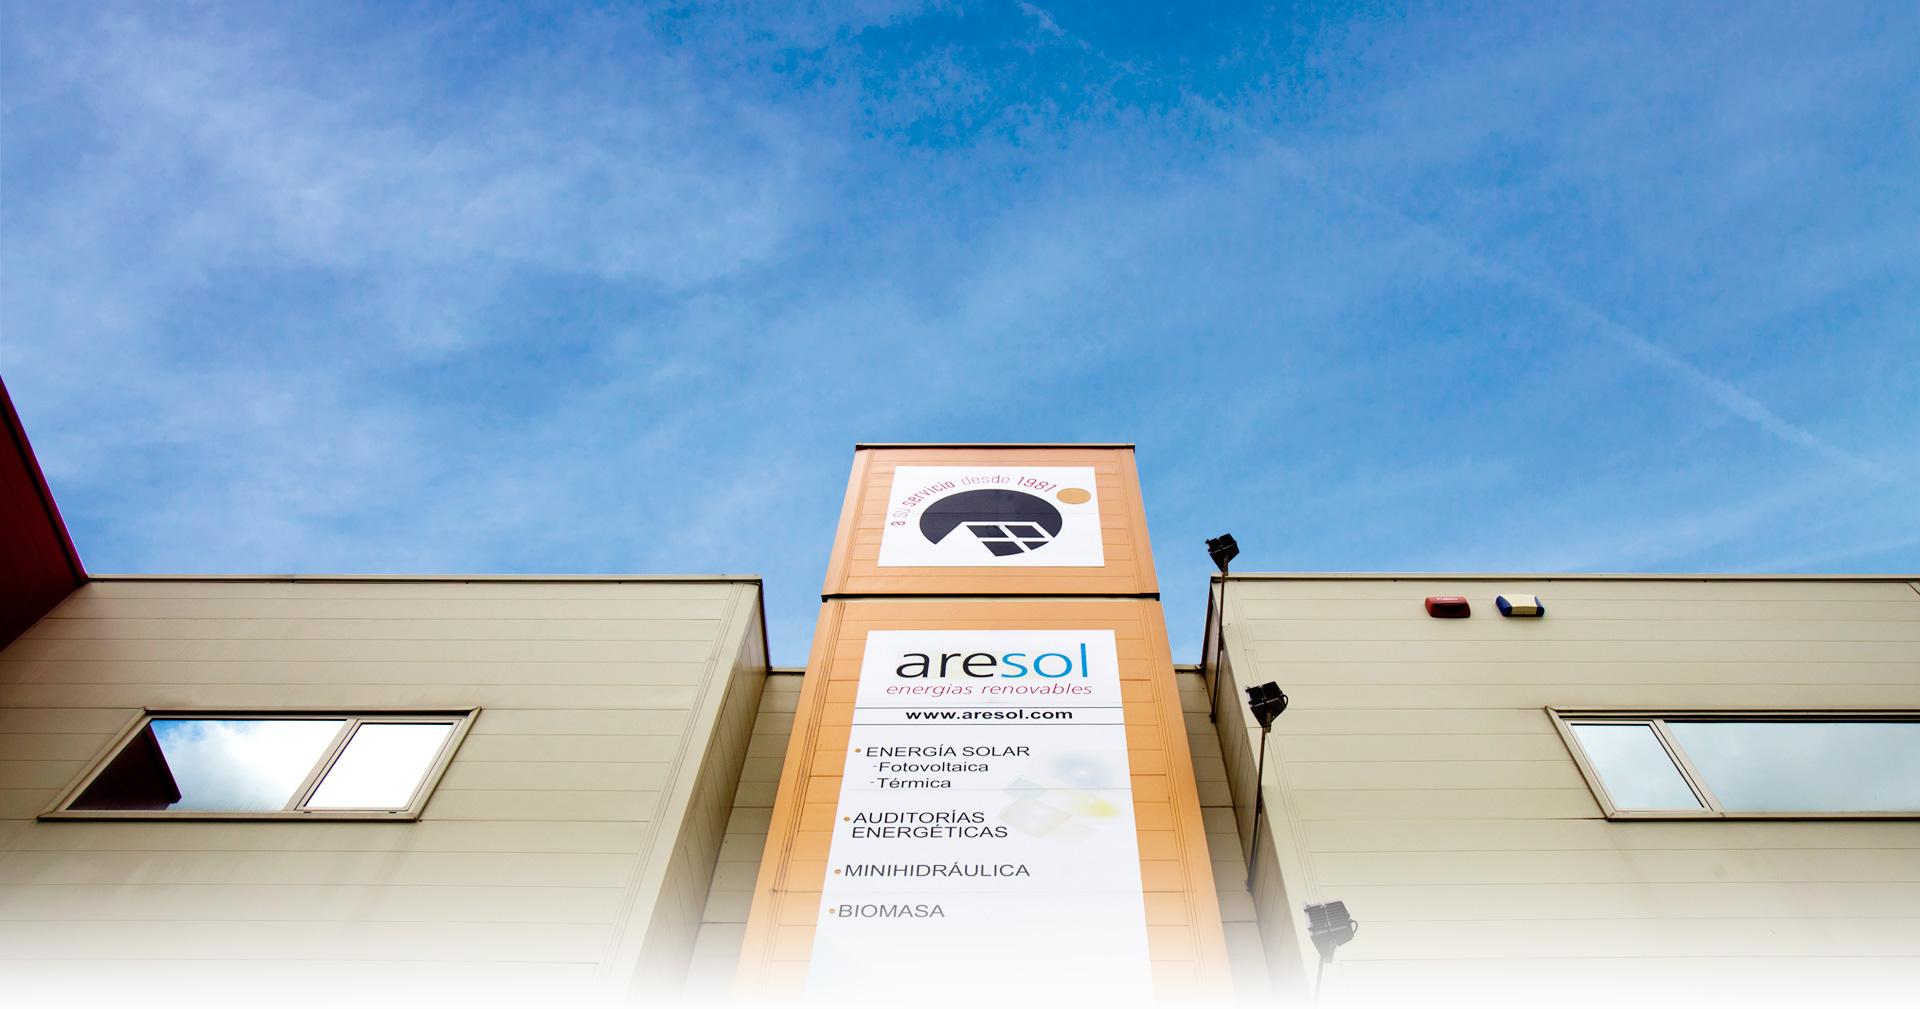 Grupo Aresol, Energías Renovables